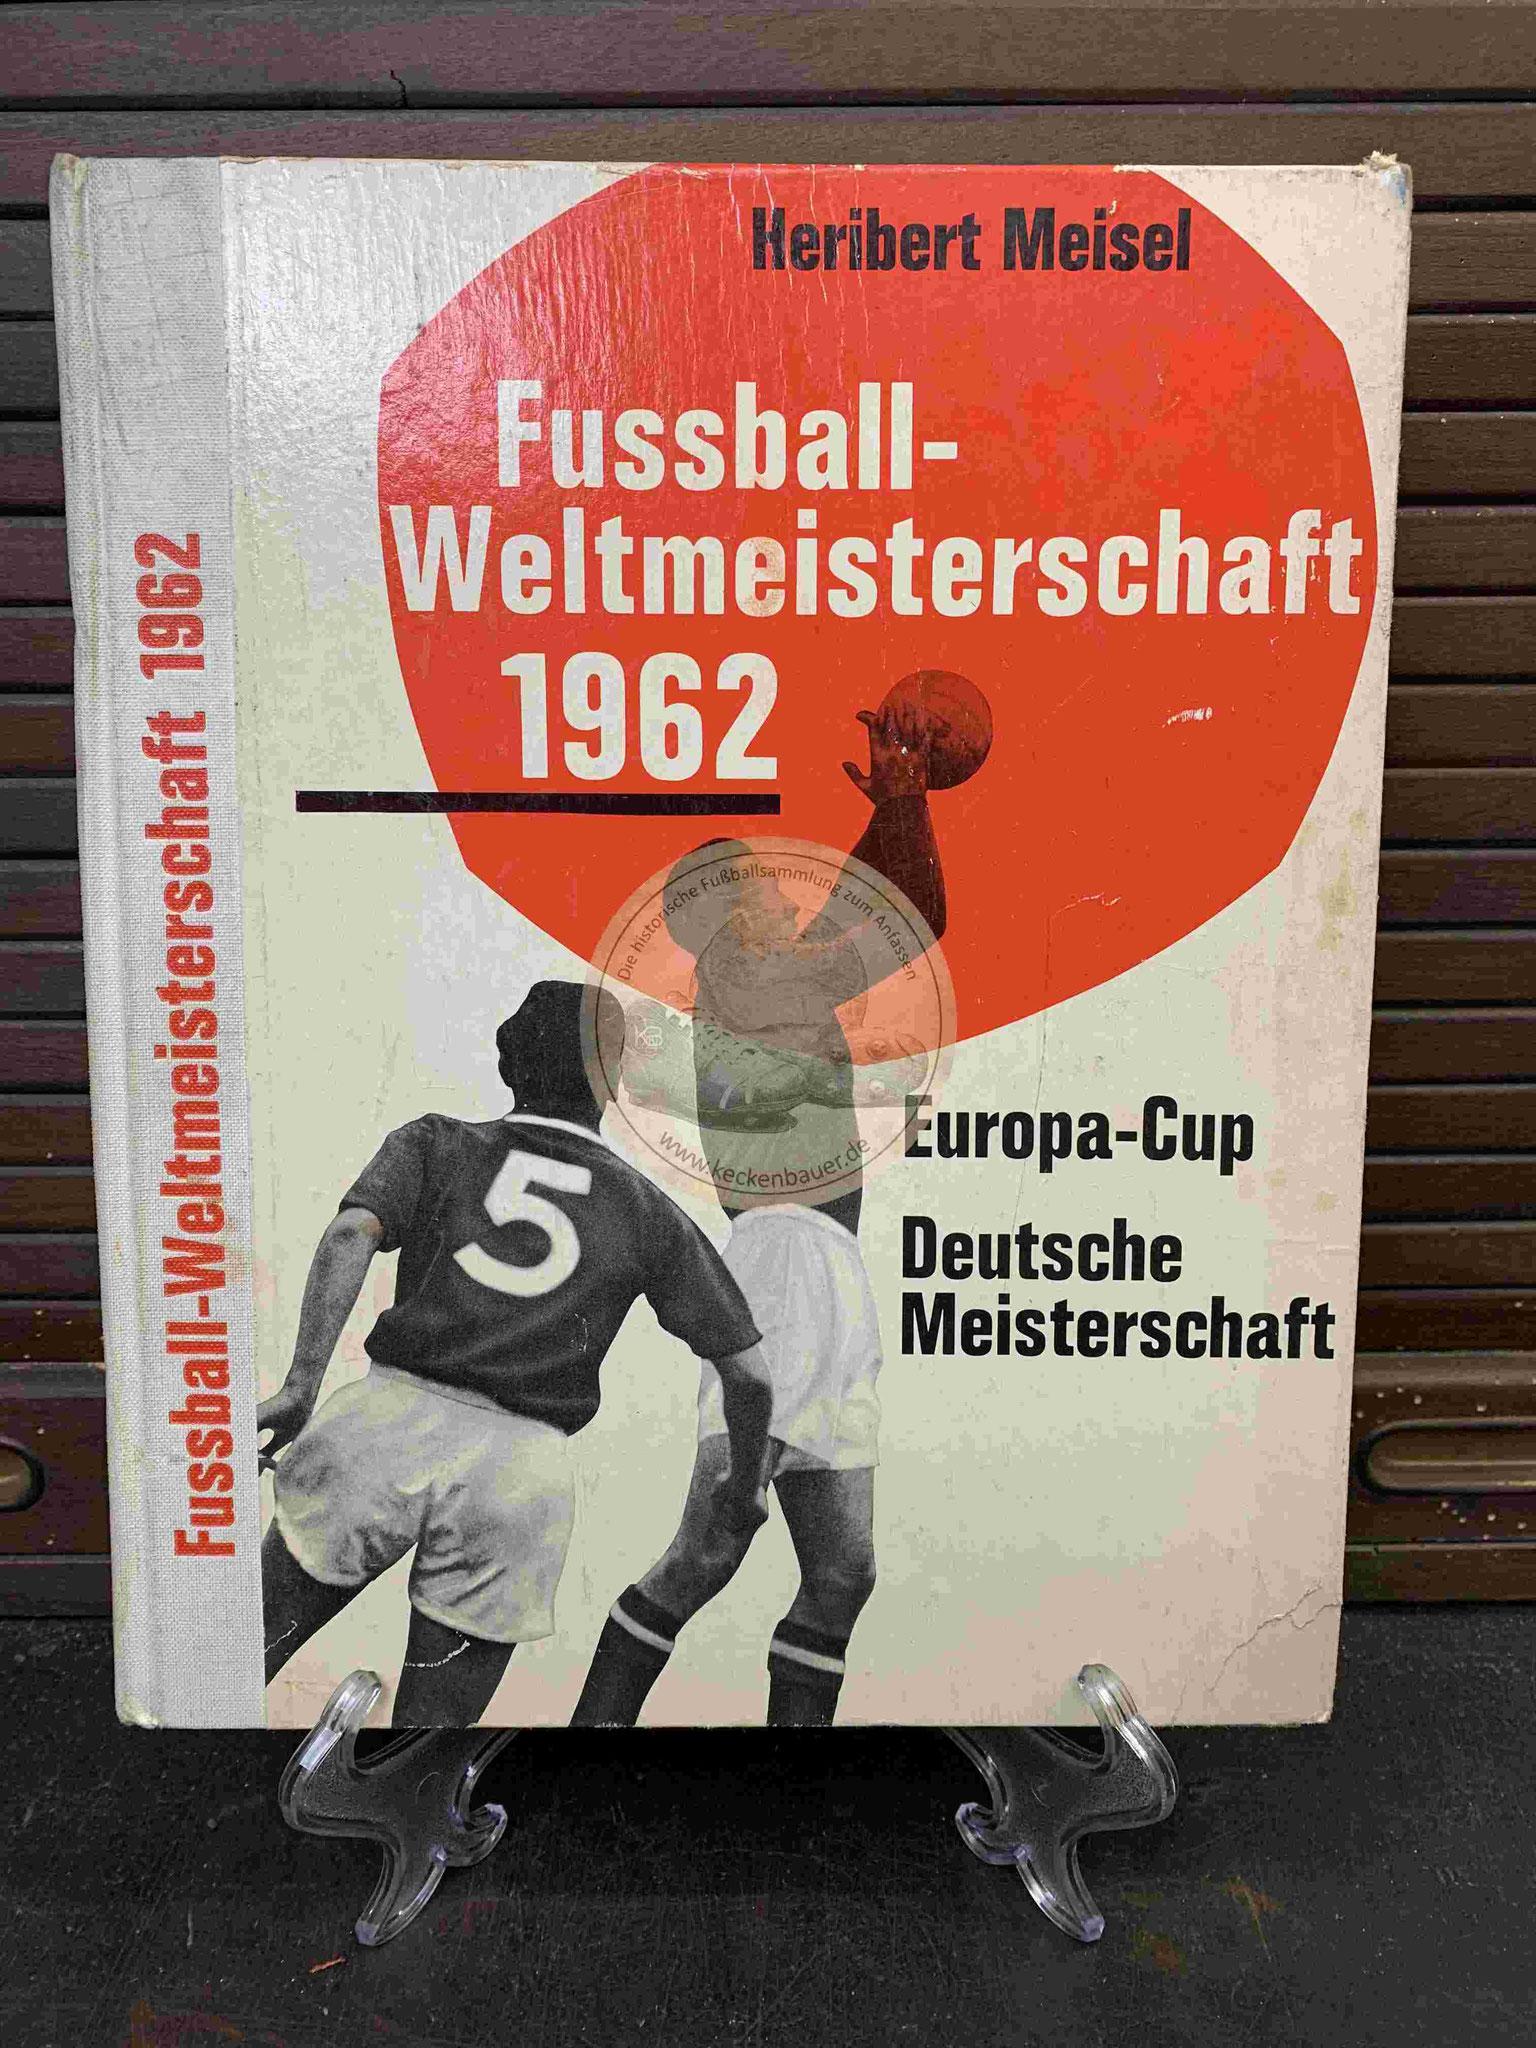 Heribert Meisel Fussball Weltmeisterschaft 1962 Europa-Cup Deutsche Meisterschaft aus dem Jahr 1962